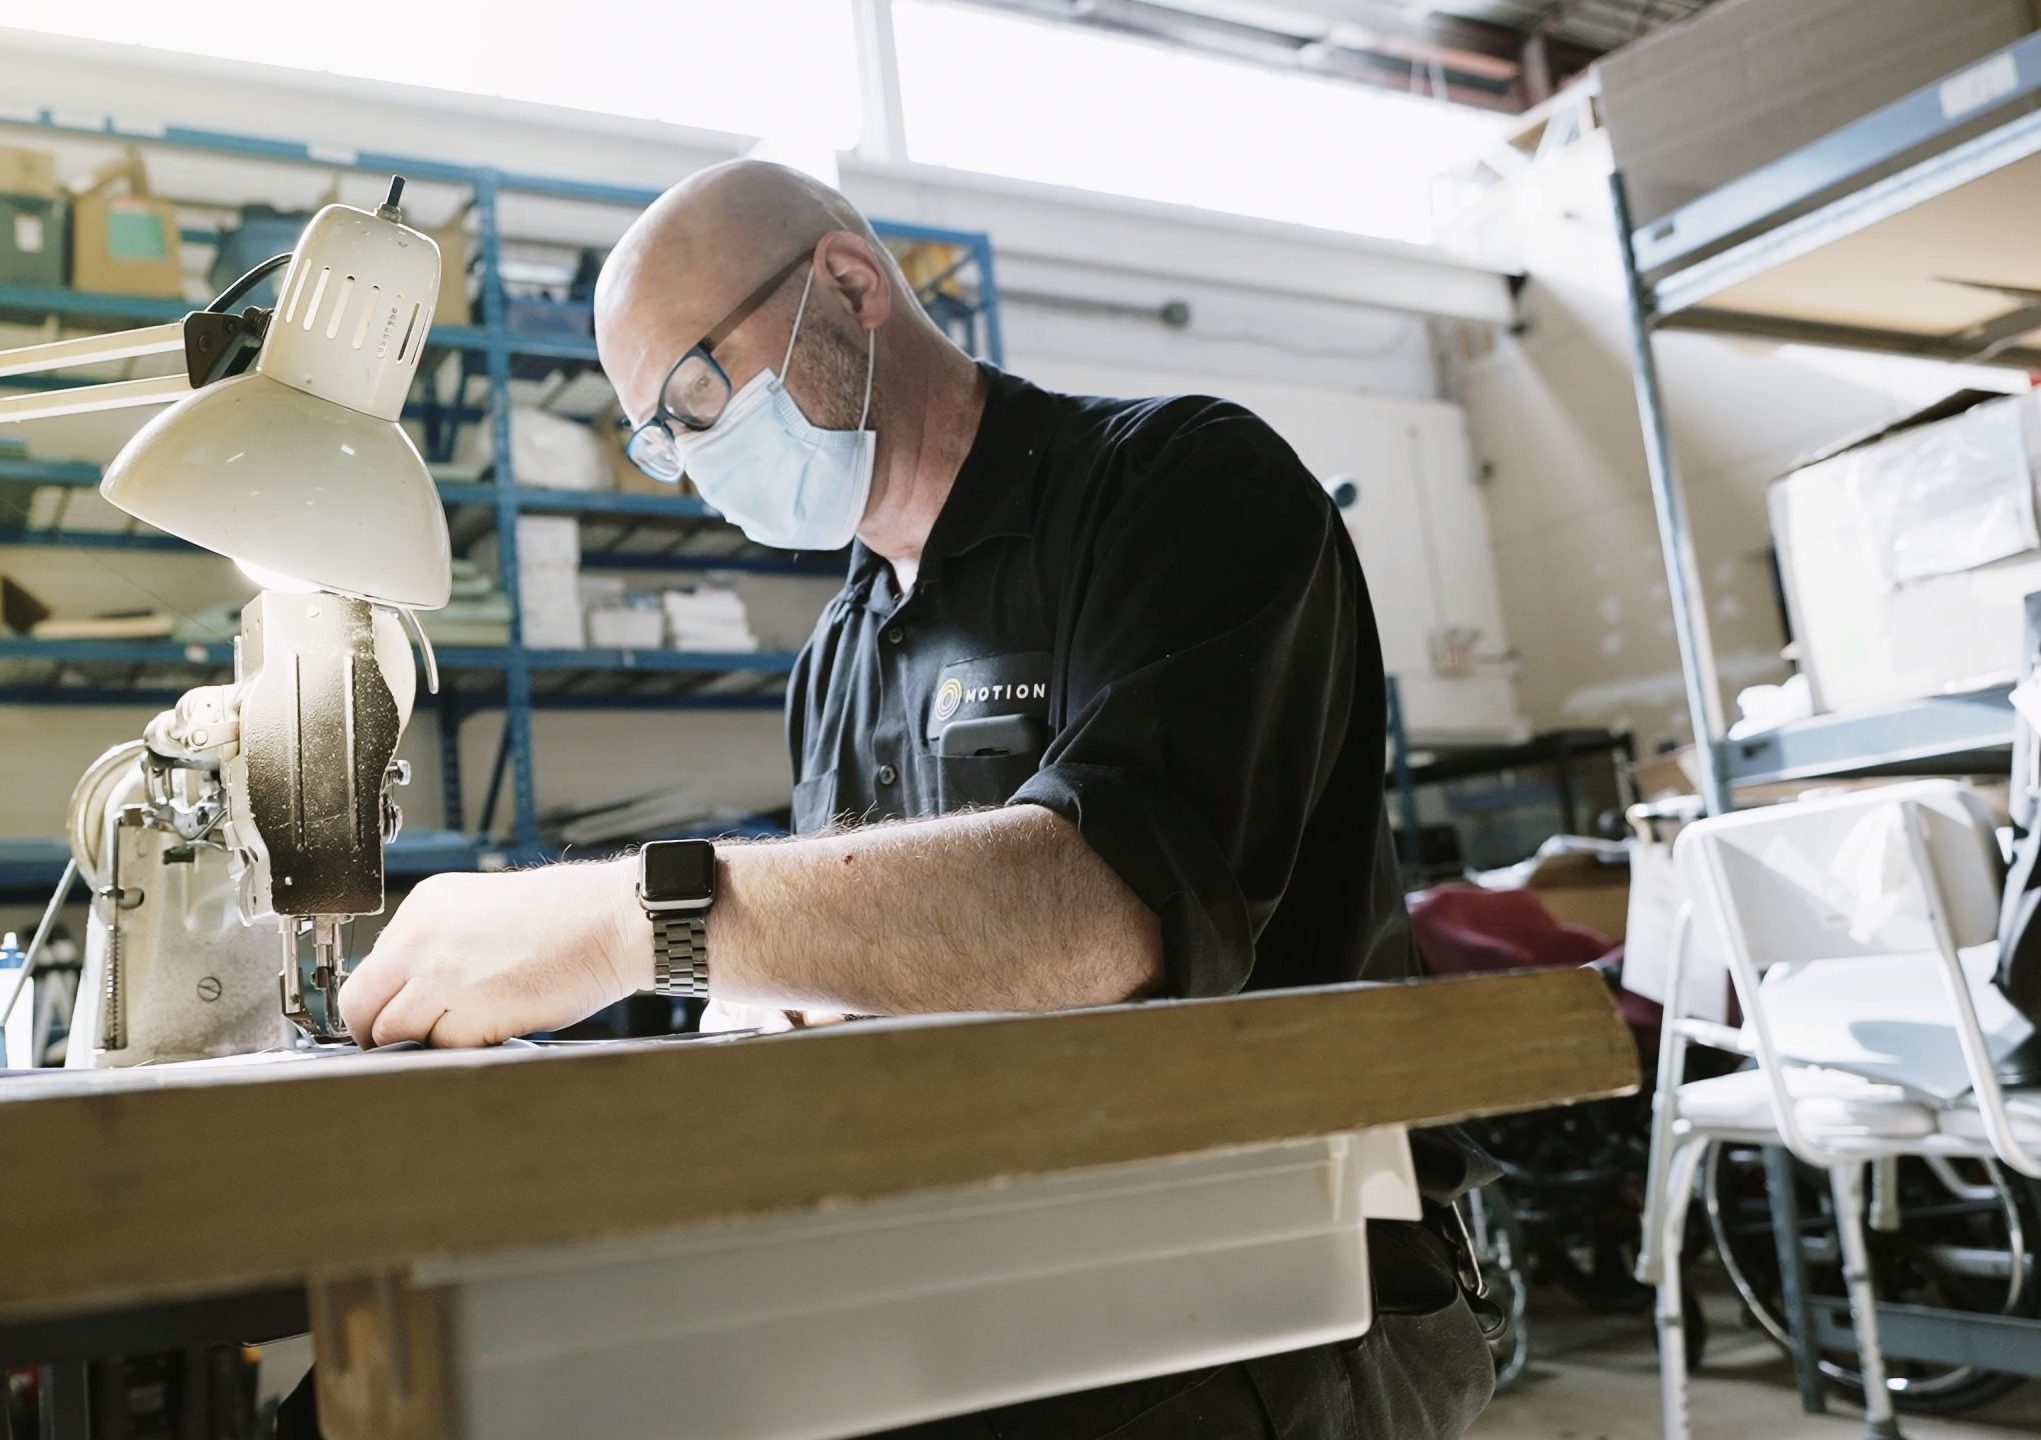 Motion manufacturer working at sewing machine.